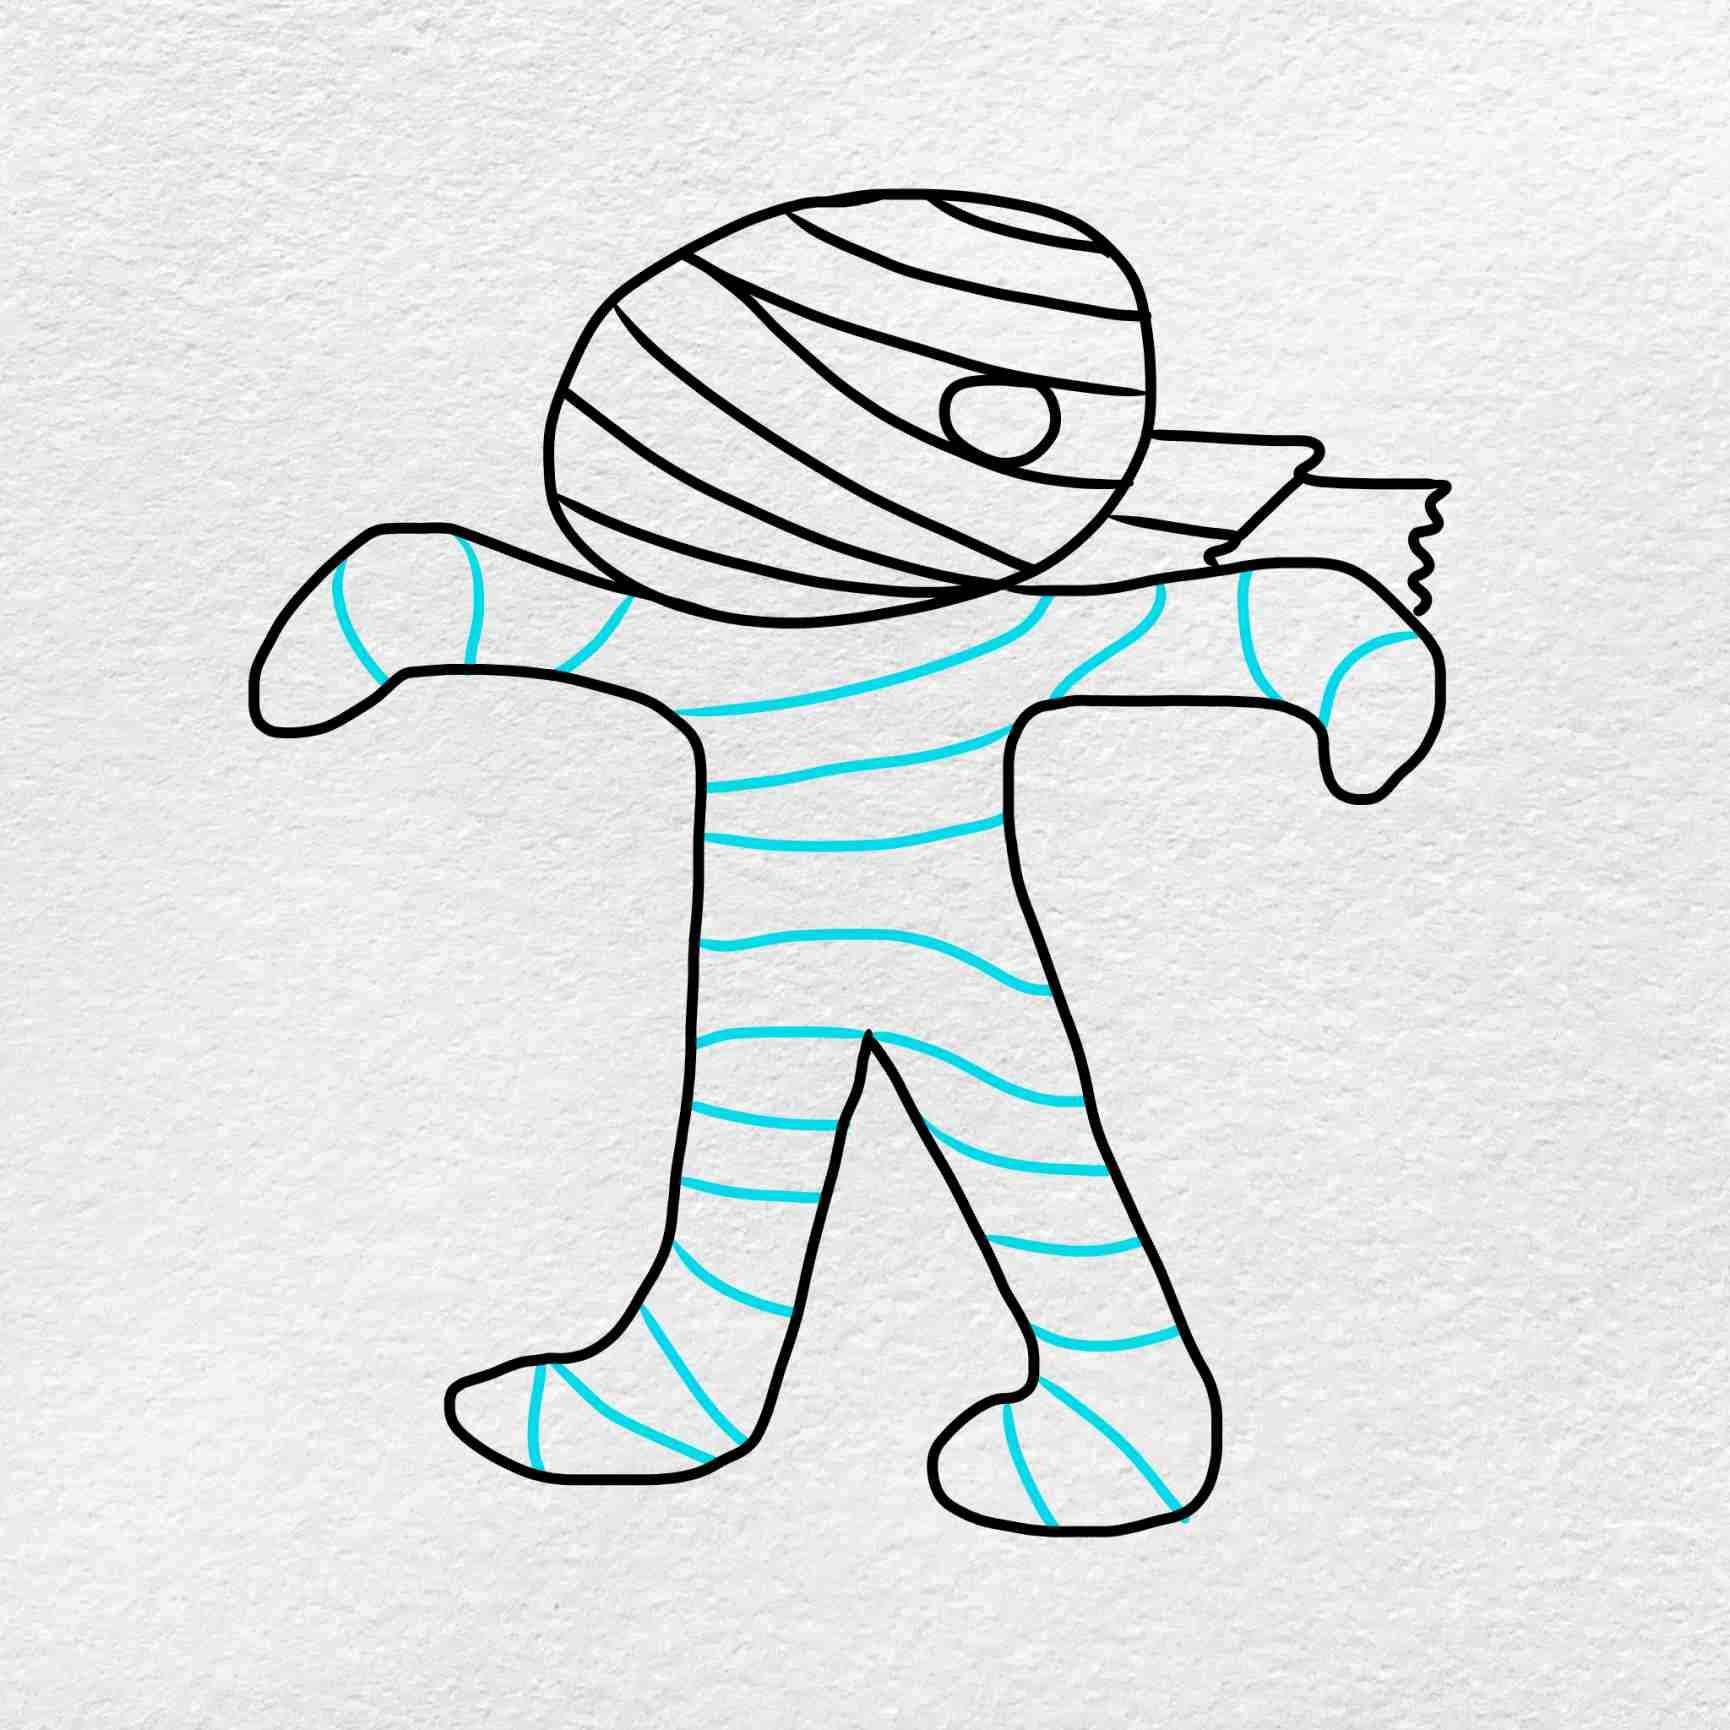 Mummy Drawing: Step 4